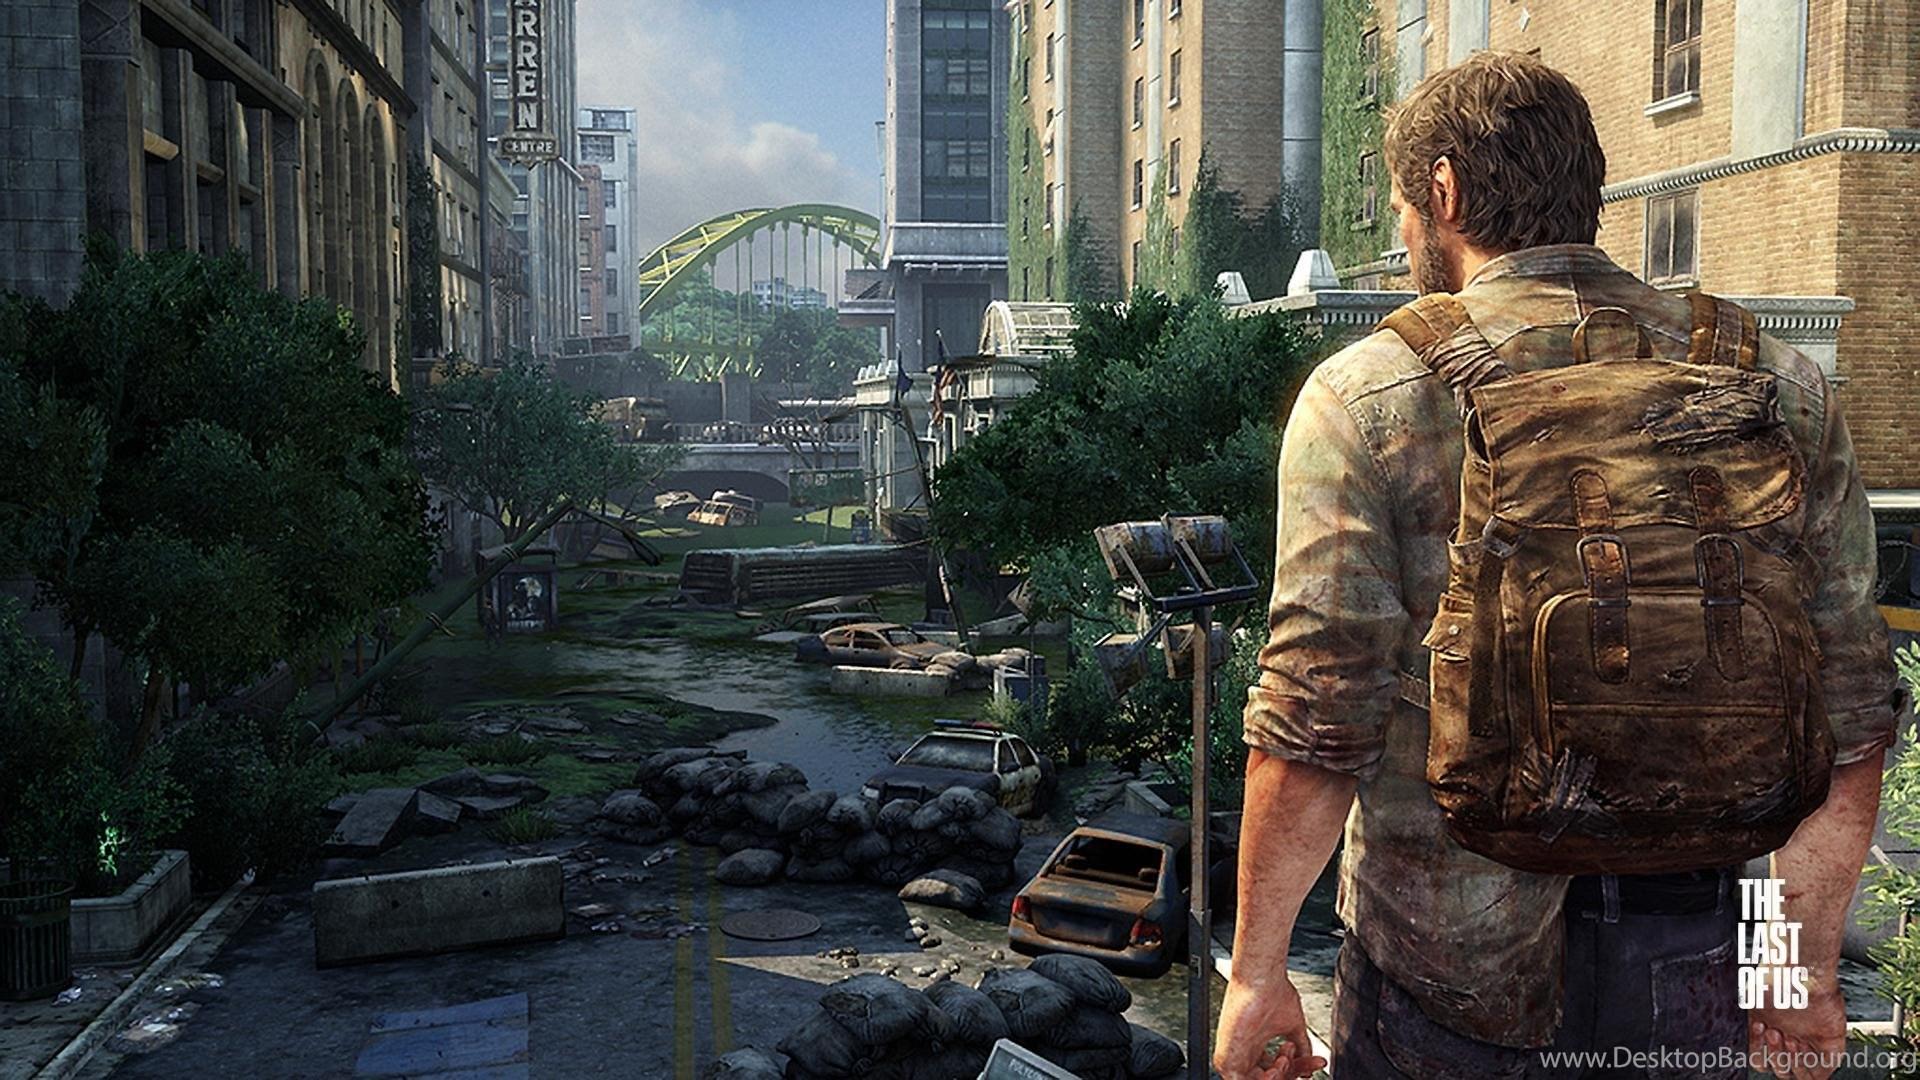 The Last Of Us Wallpapers Desktop Background